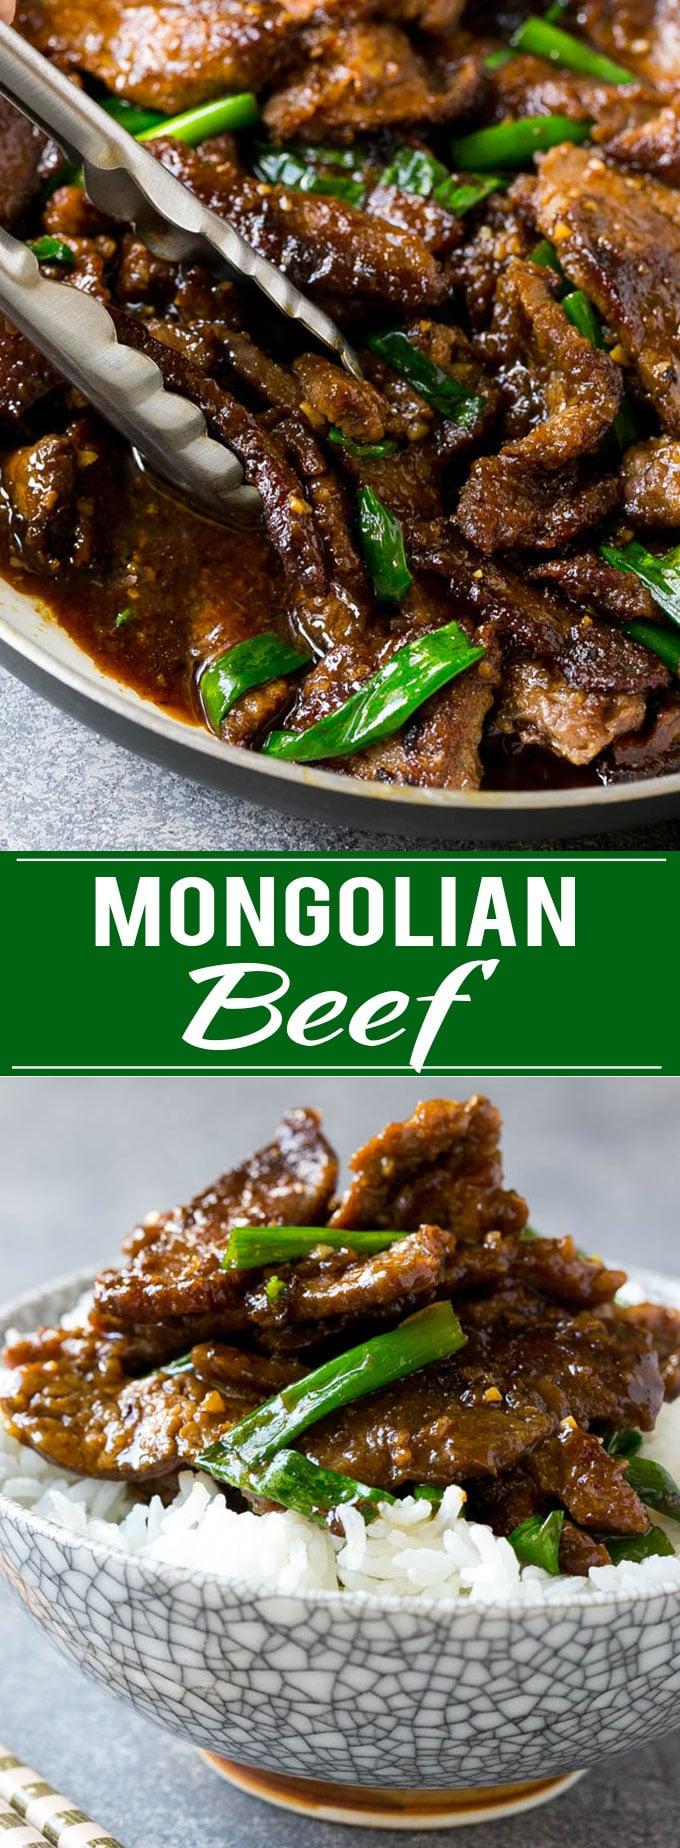 Mongolian Beef Recipe | Asian Beef Recipe | Beef Stir Fry | Copycat Recipe